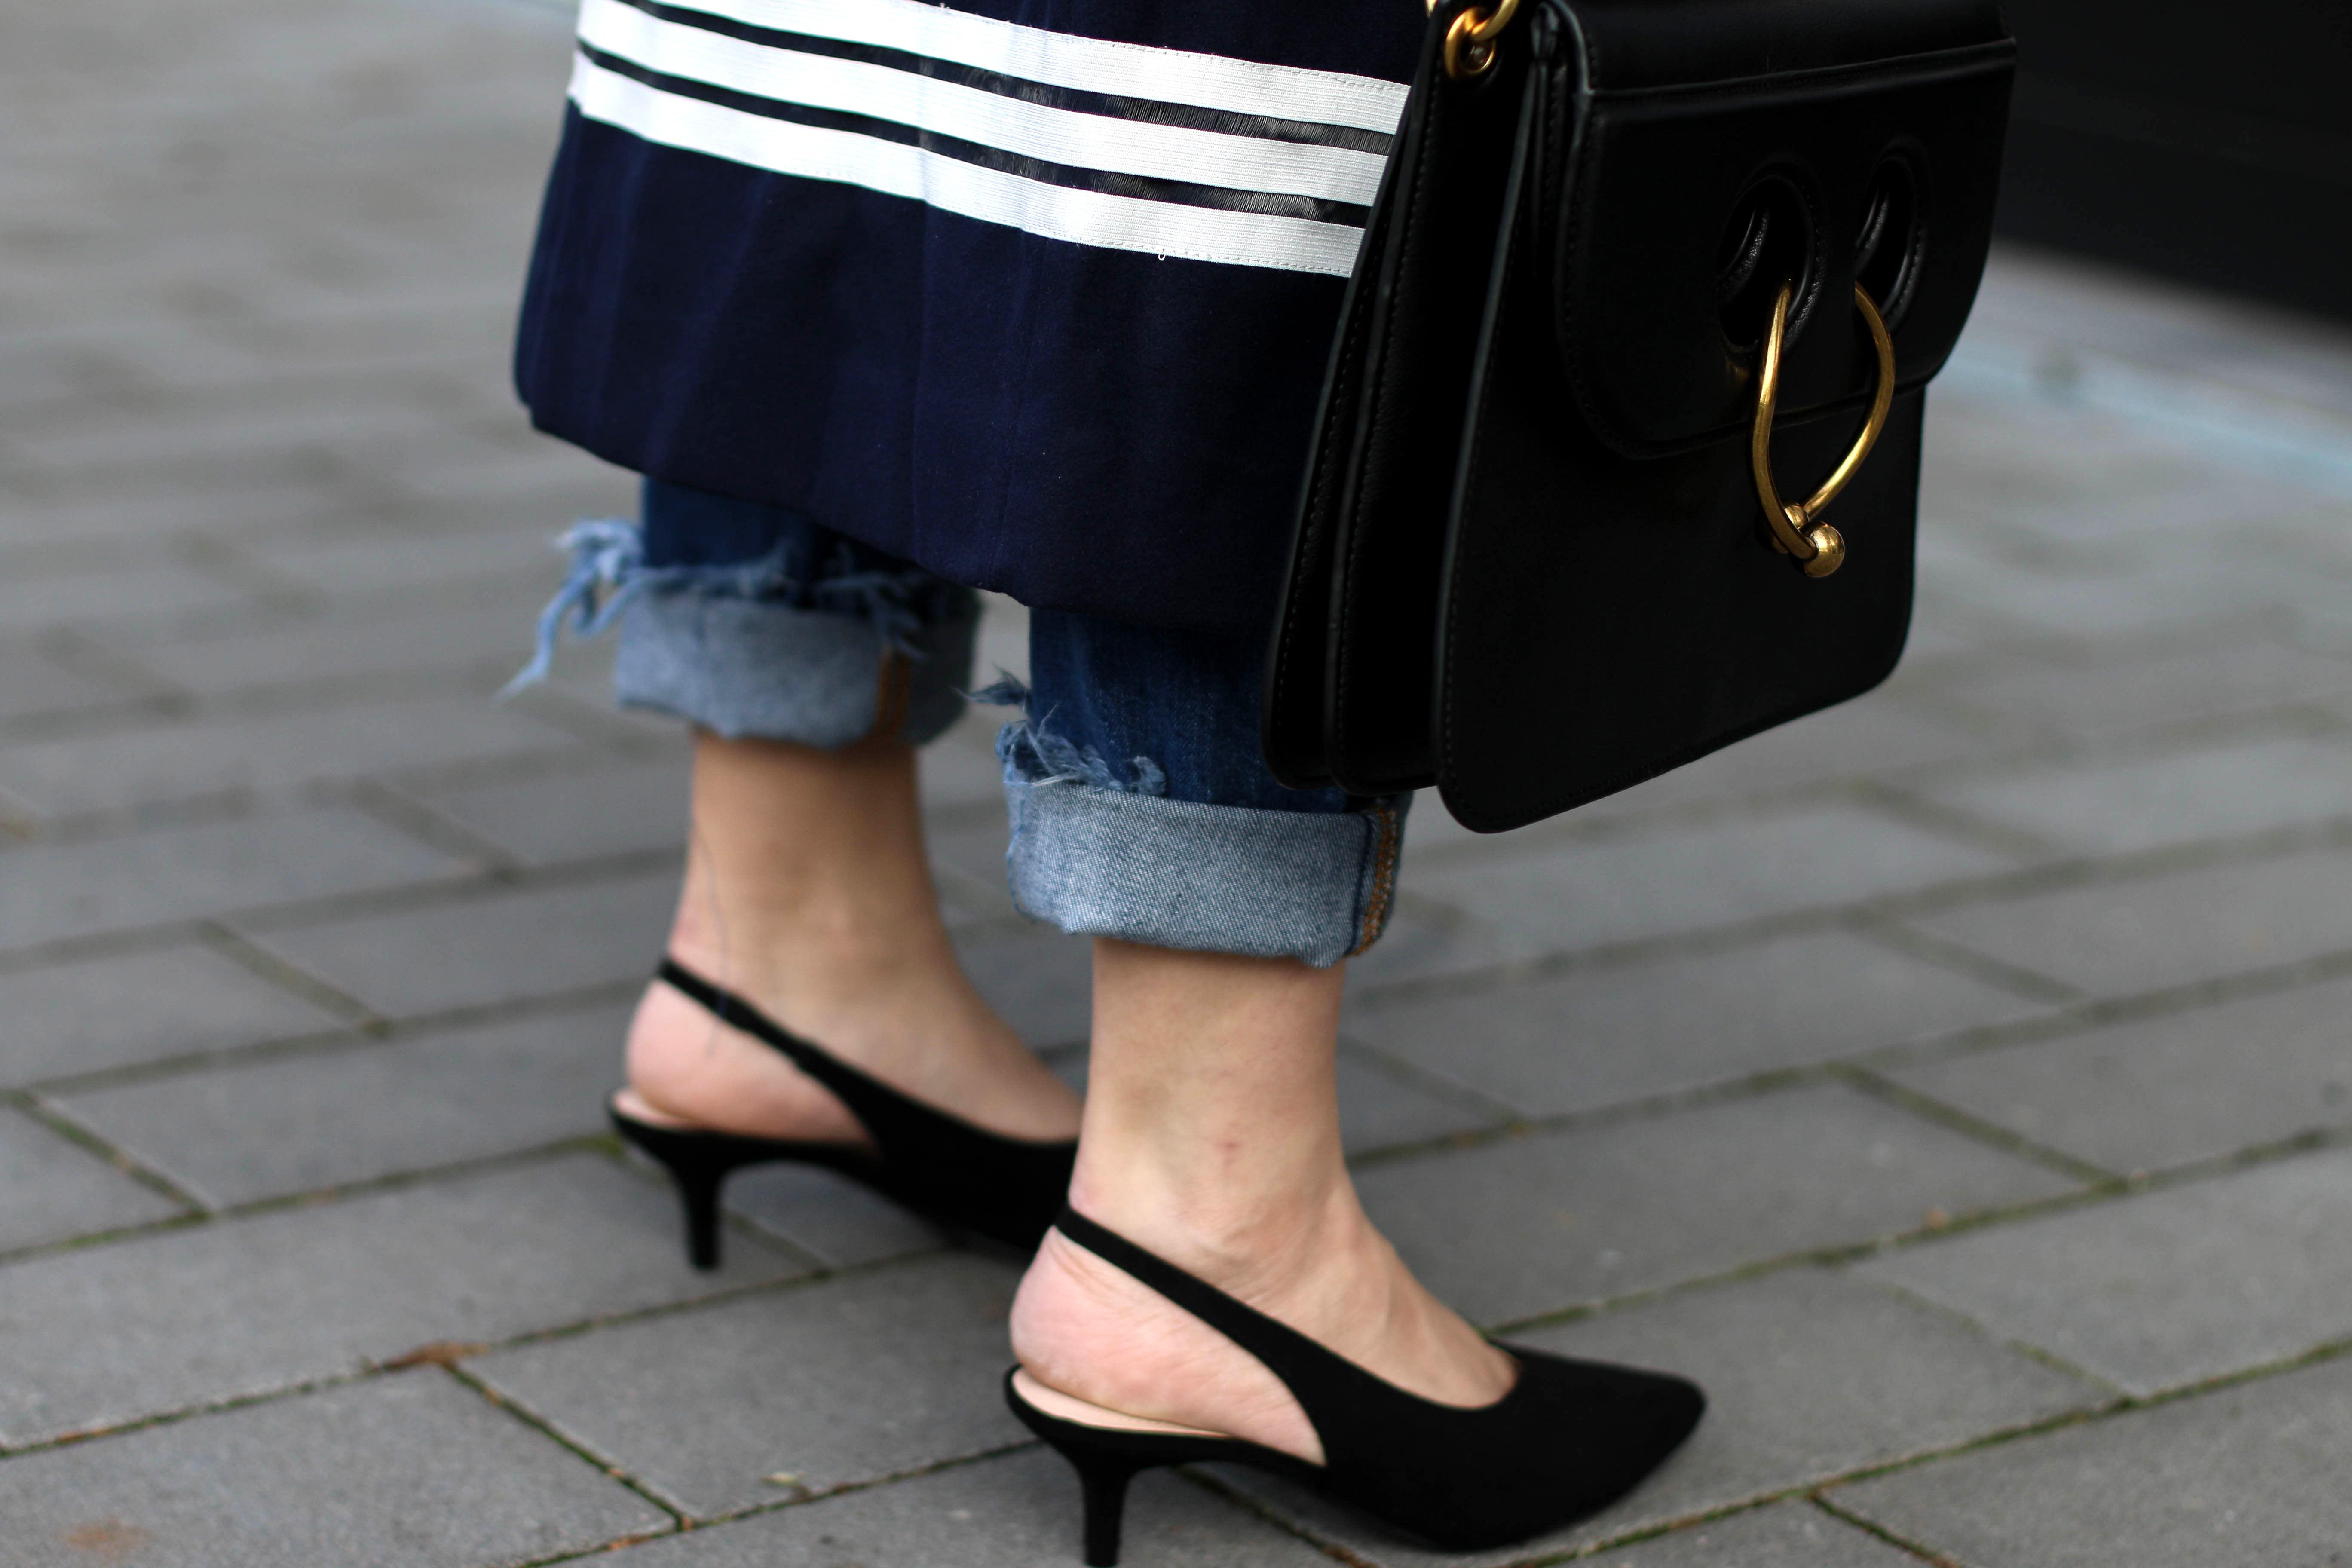 Sheinside Maxi Coat Streetstyle Slingback pumps JW Anderson Bag